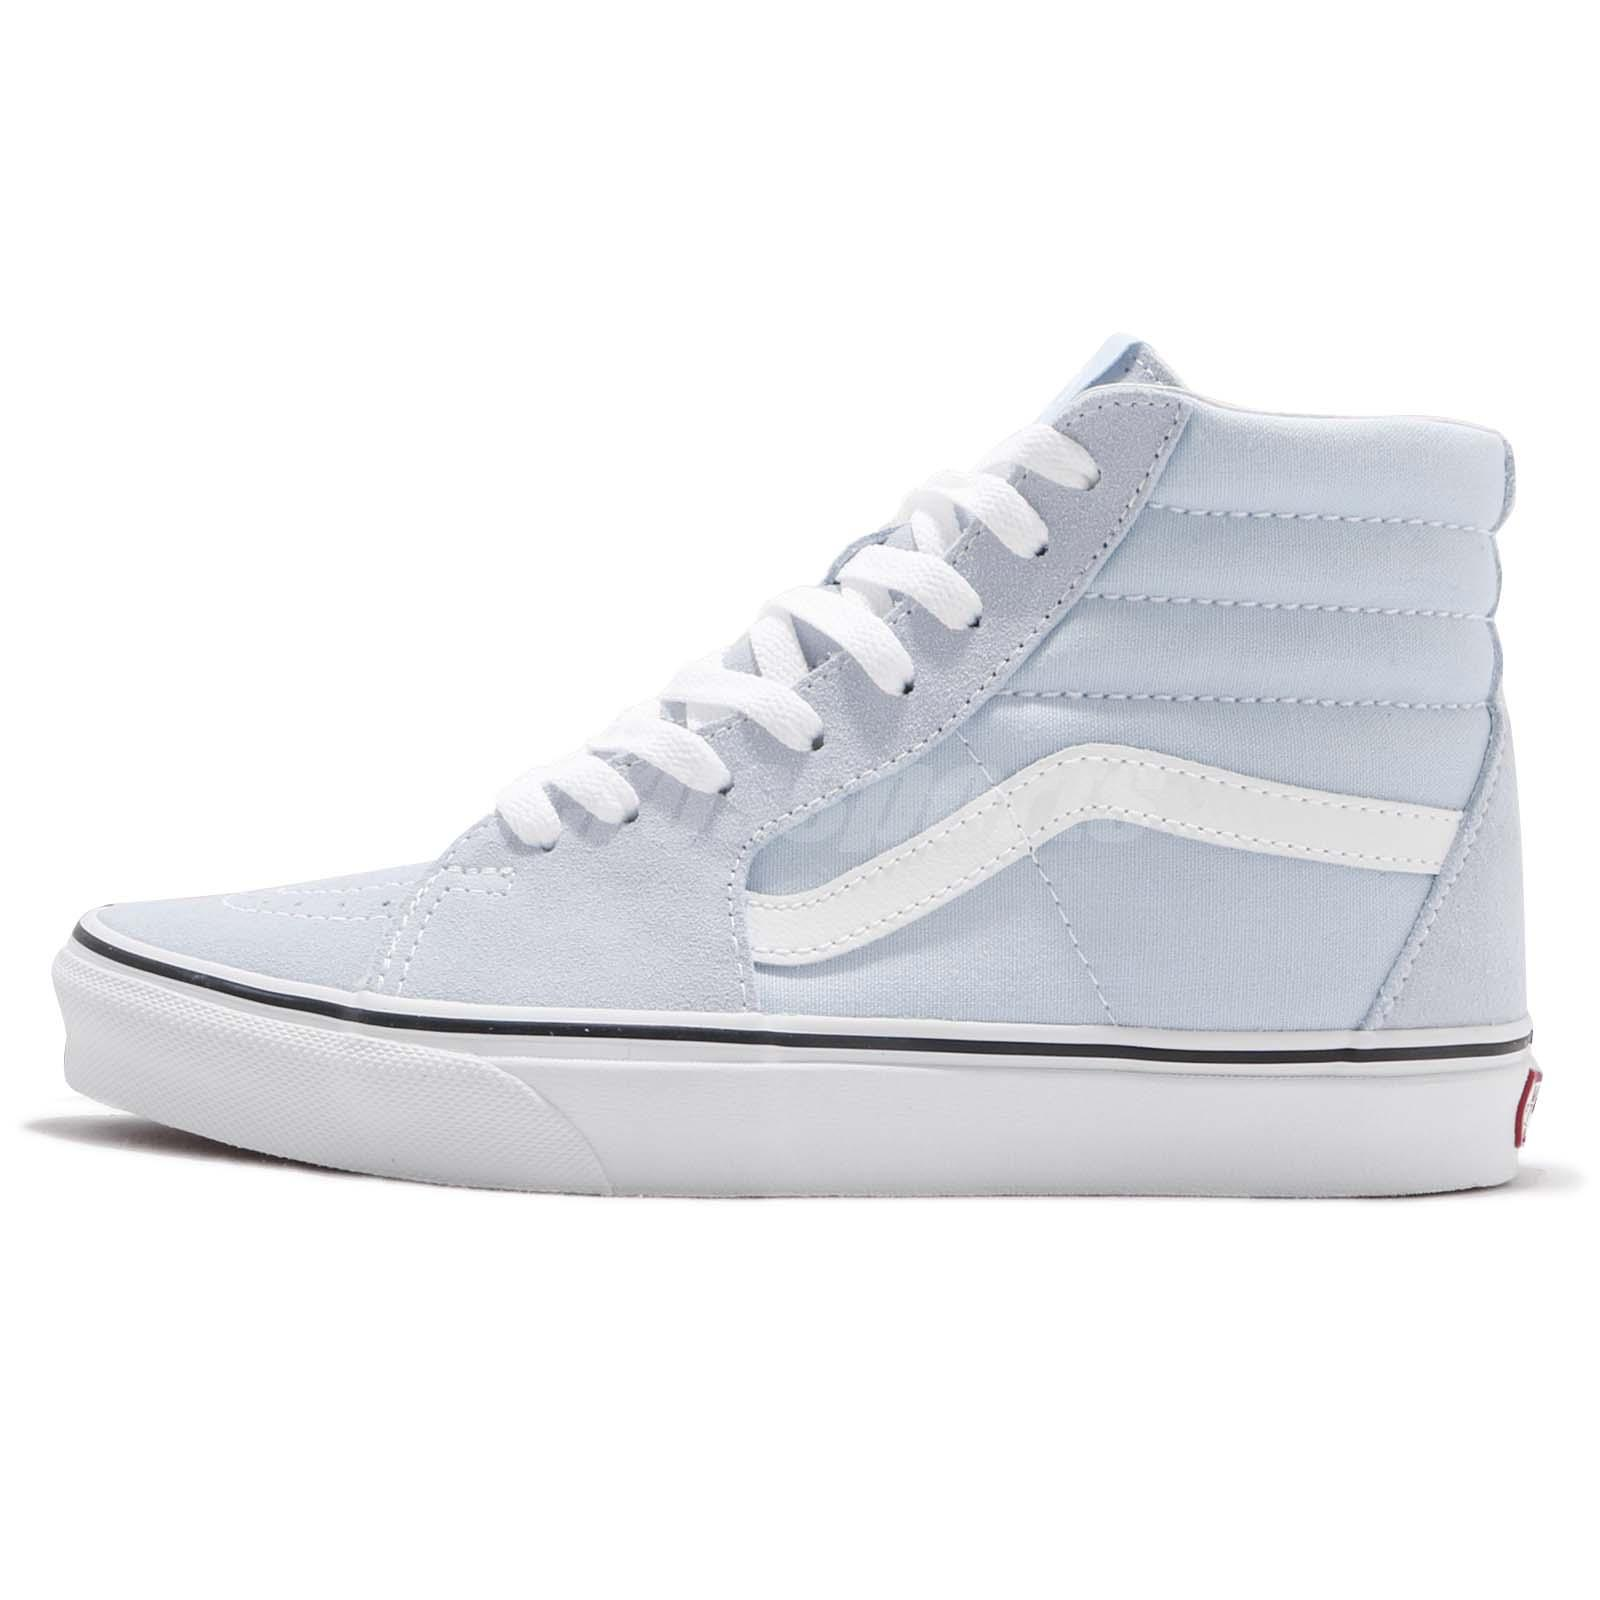 4094e4f1810 Vans SK8-Hi Baby Blue White Men Skate Boarding Casual Shoes Sneakers  VN0A38GEQ6K